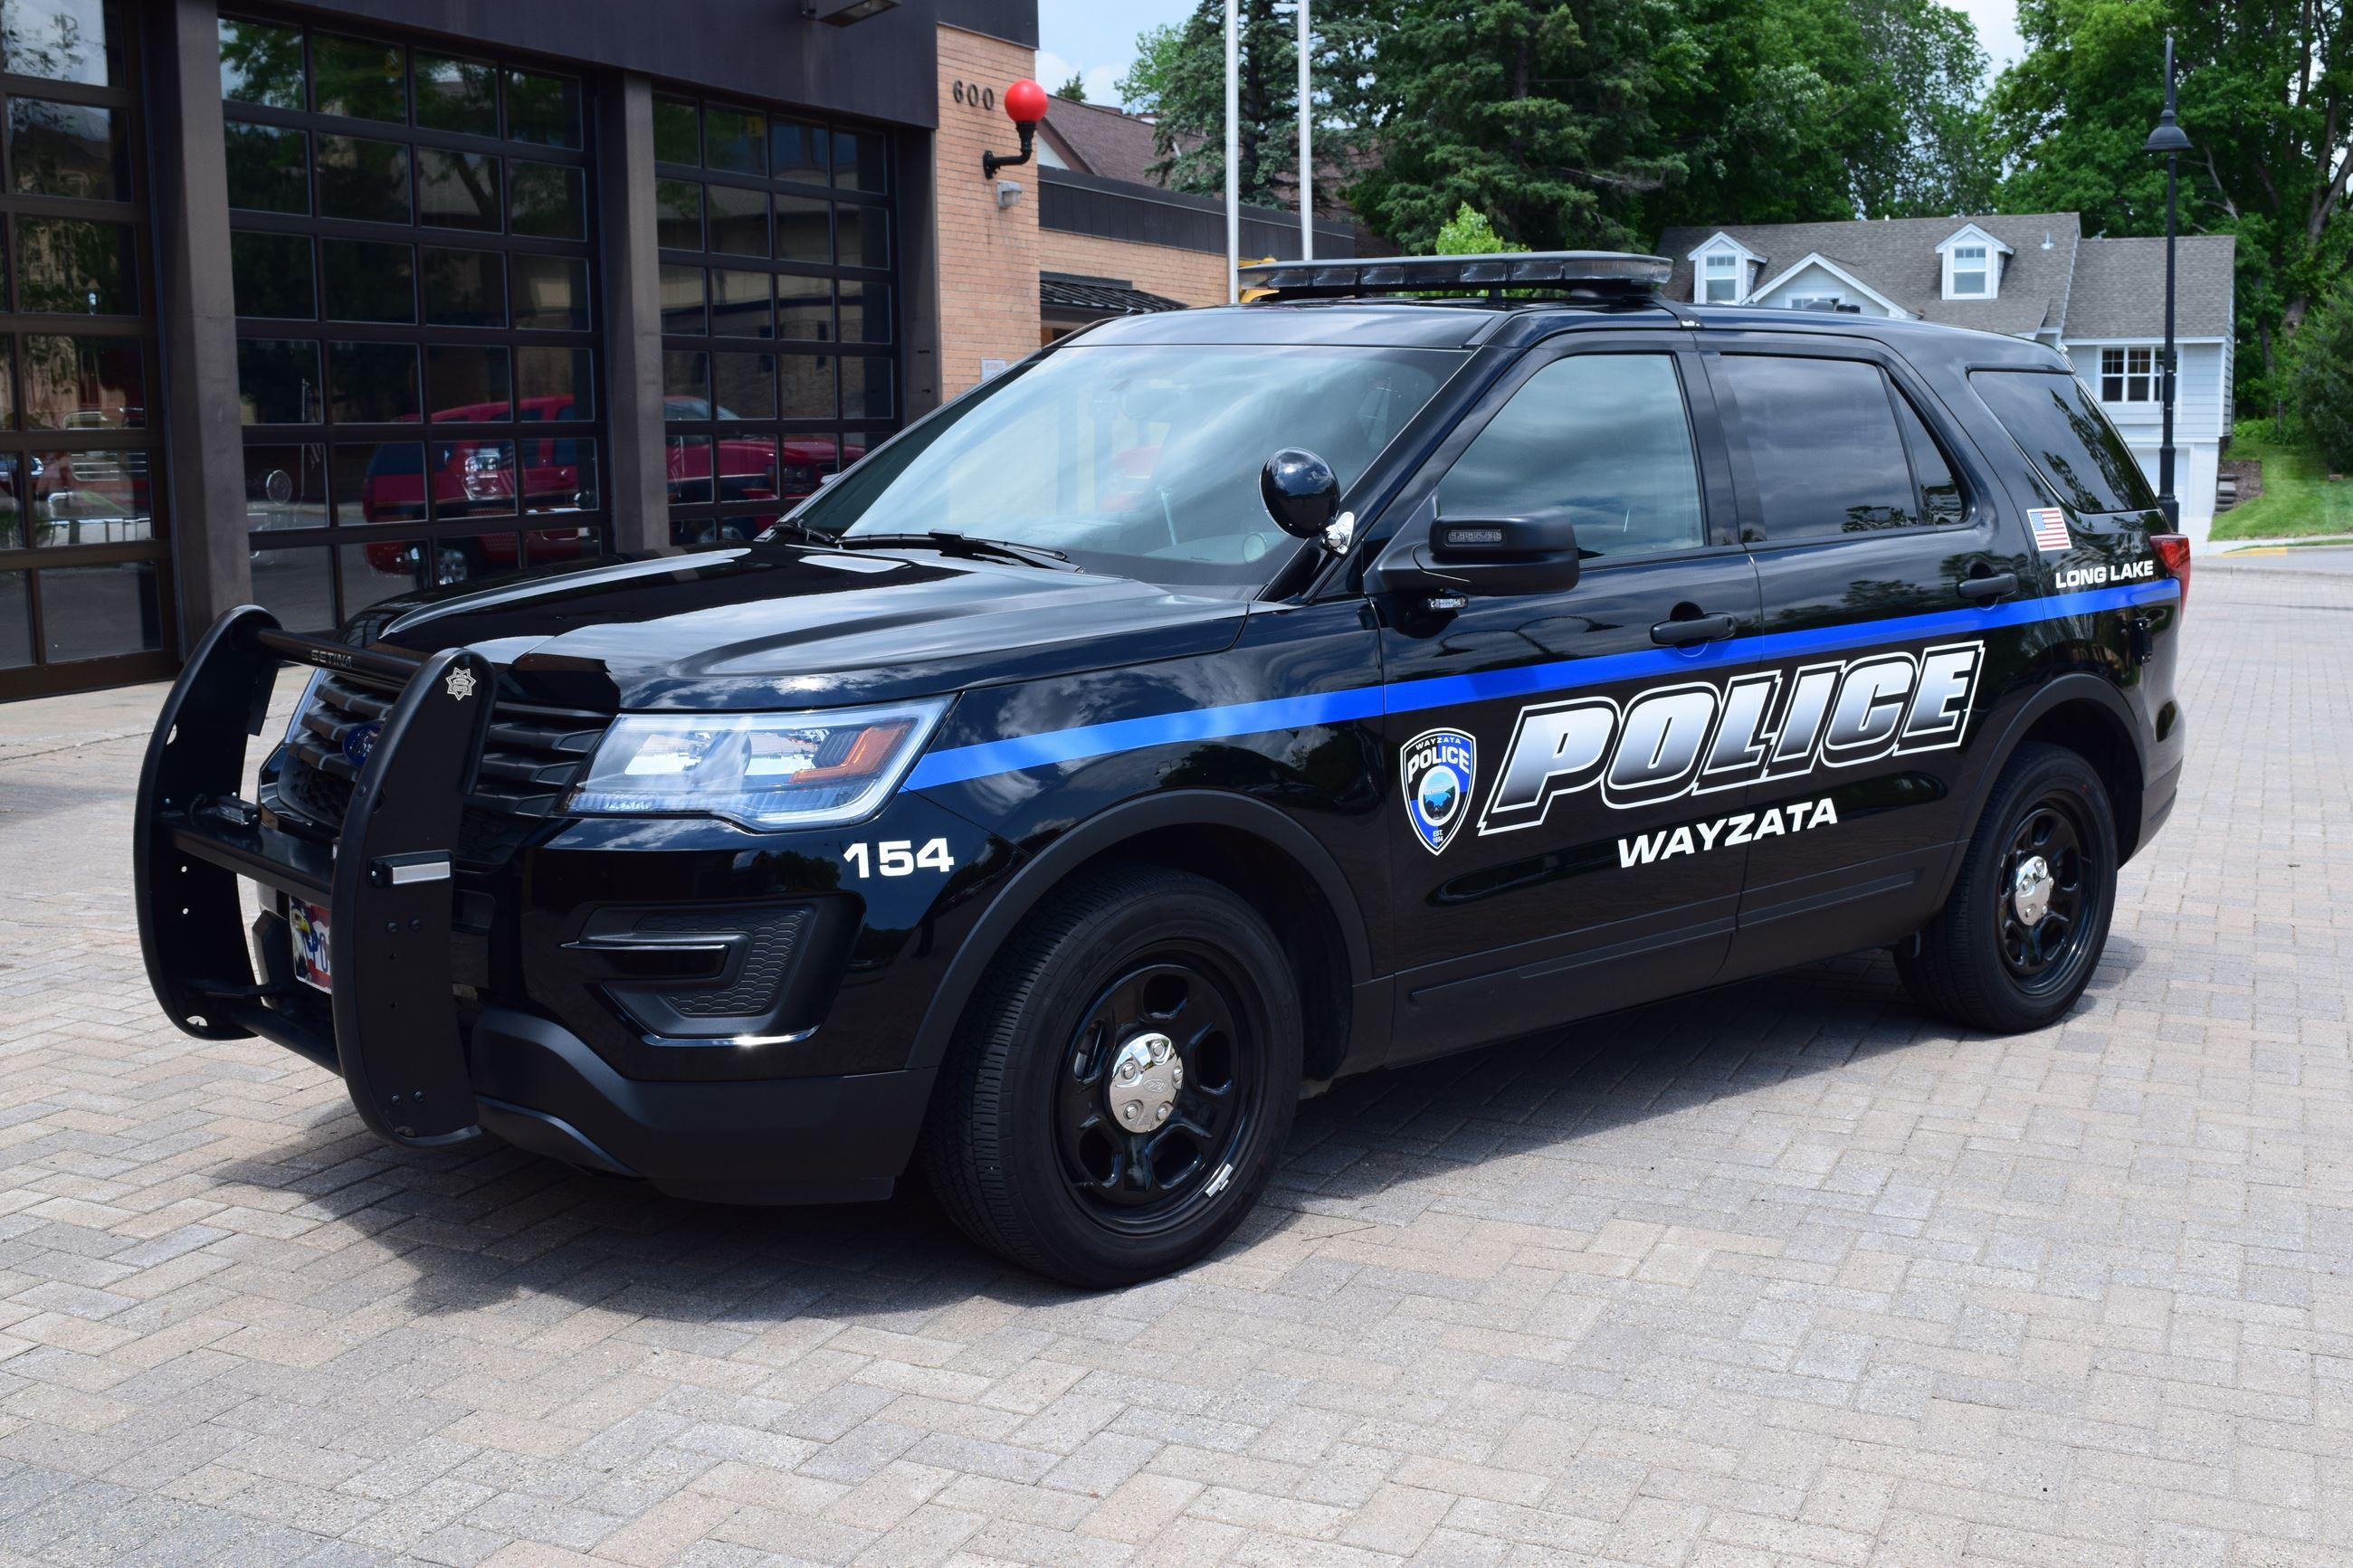 Police Department   Wayzata, MN - Official Website